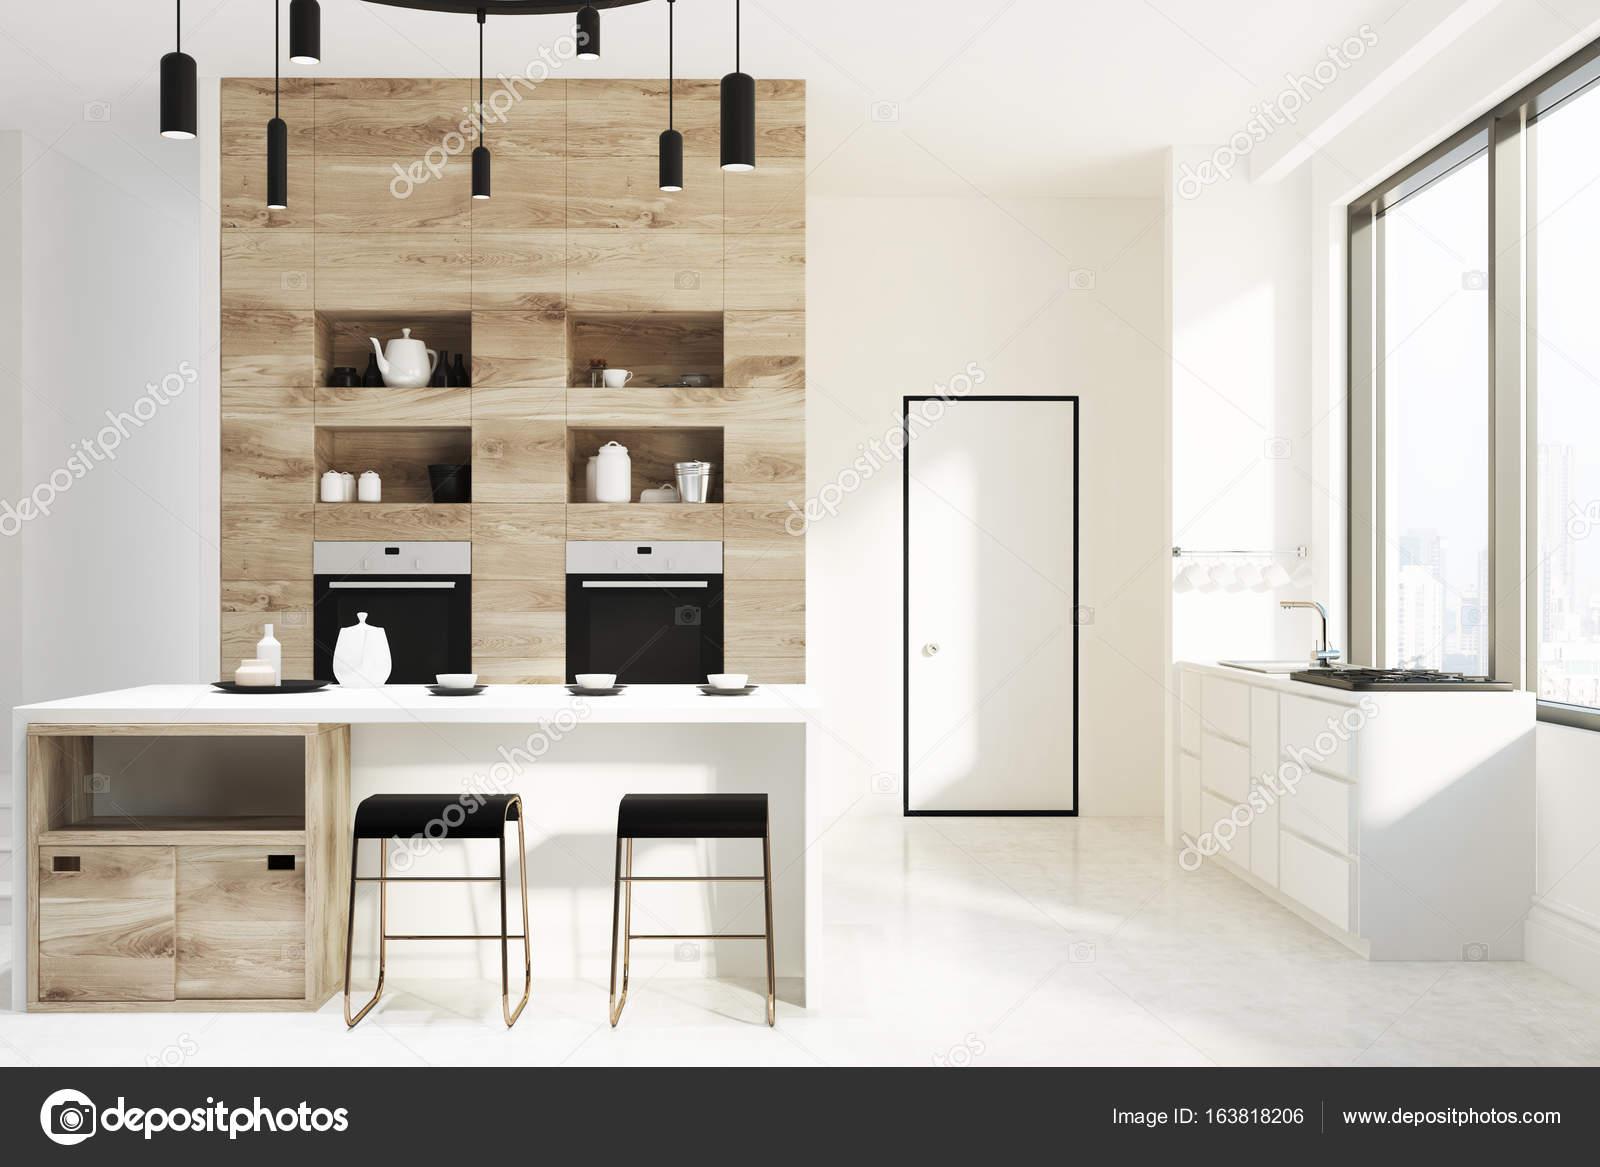 Bar cucina bianca e in legno porta u foto stock denisismagilov